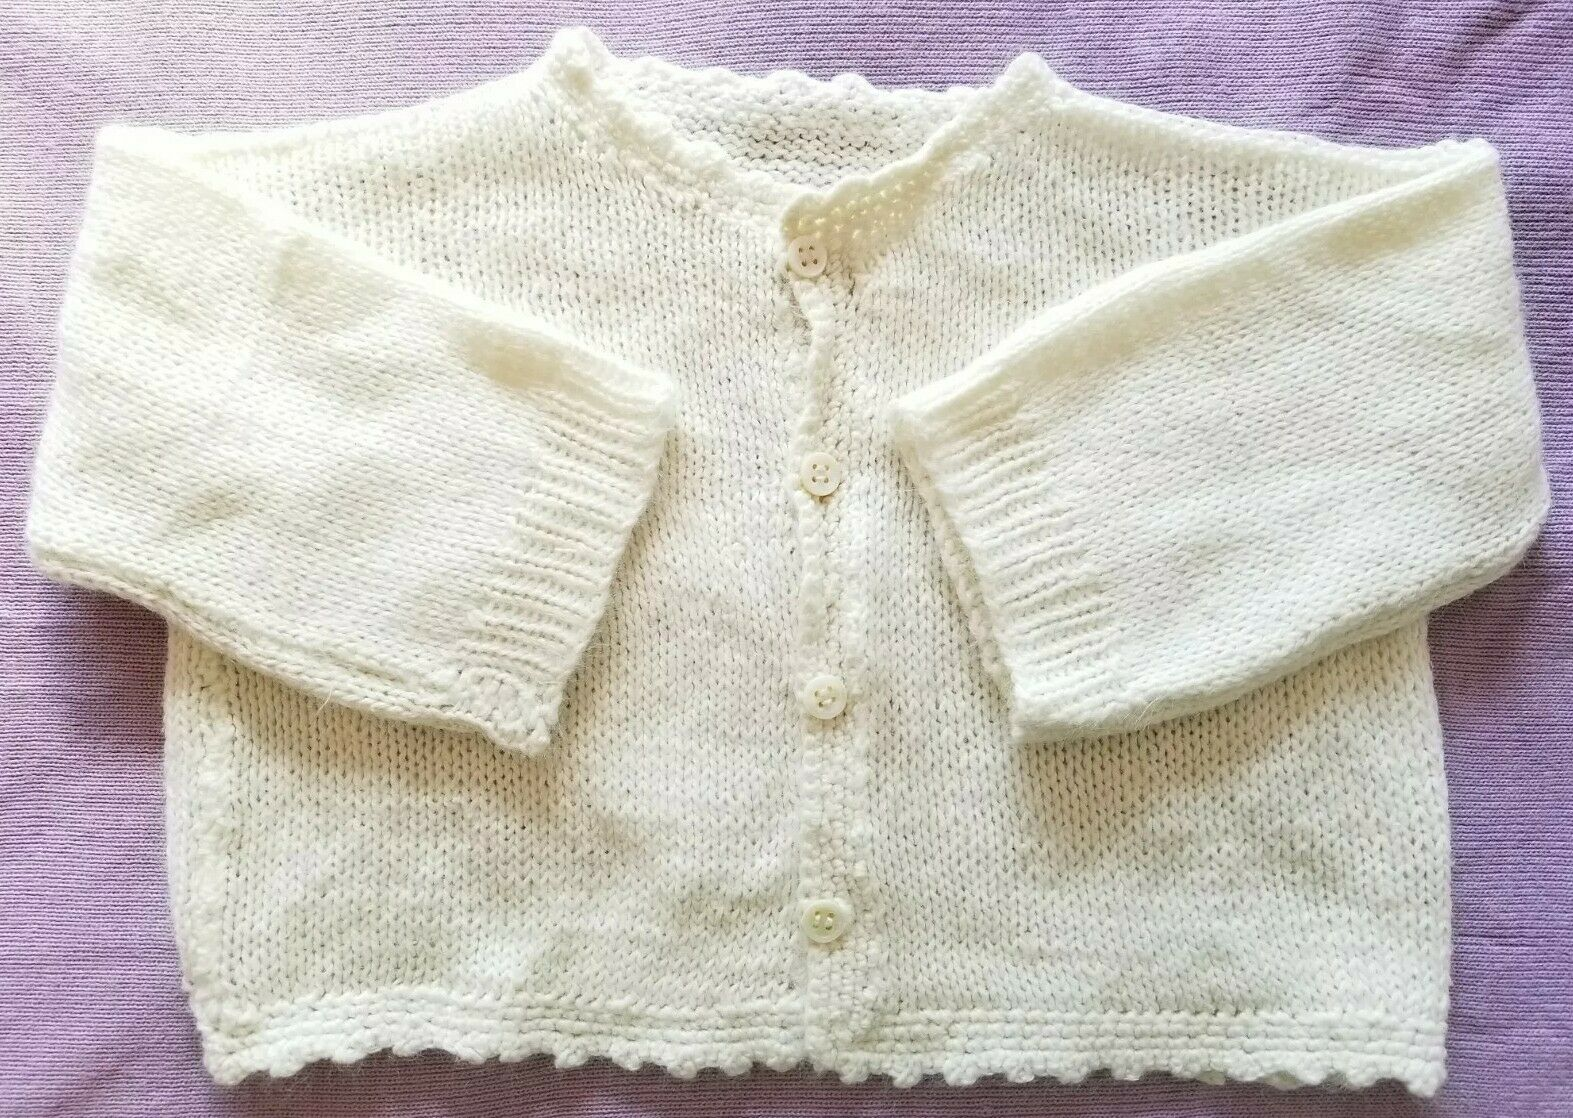 hand knit baby girl cardigan HANDKNIT BABY CARDIGAN hand knit baby sweater 0-3  months baby cardigan pink baby cardigan